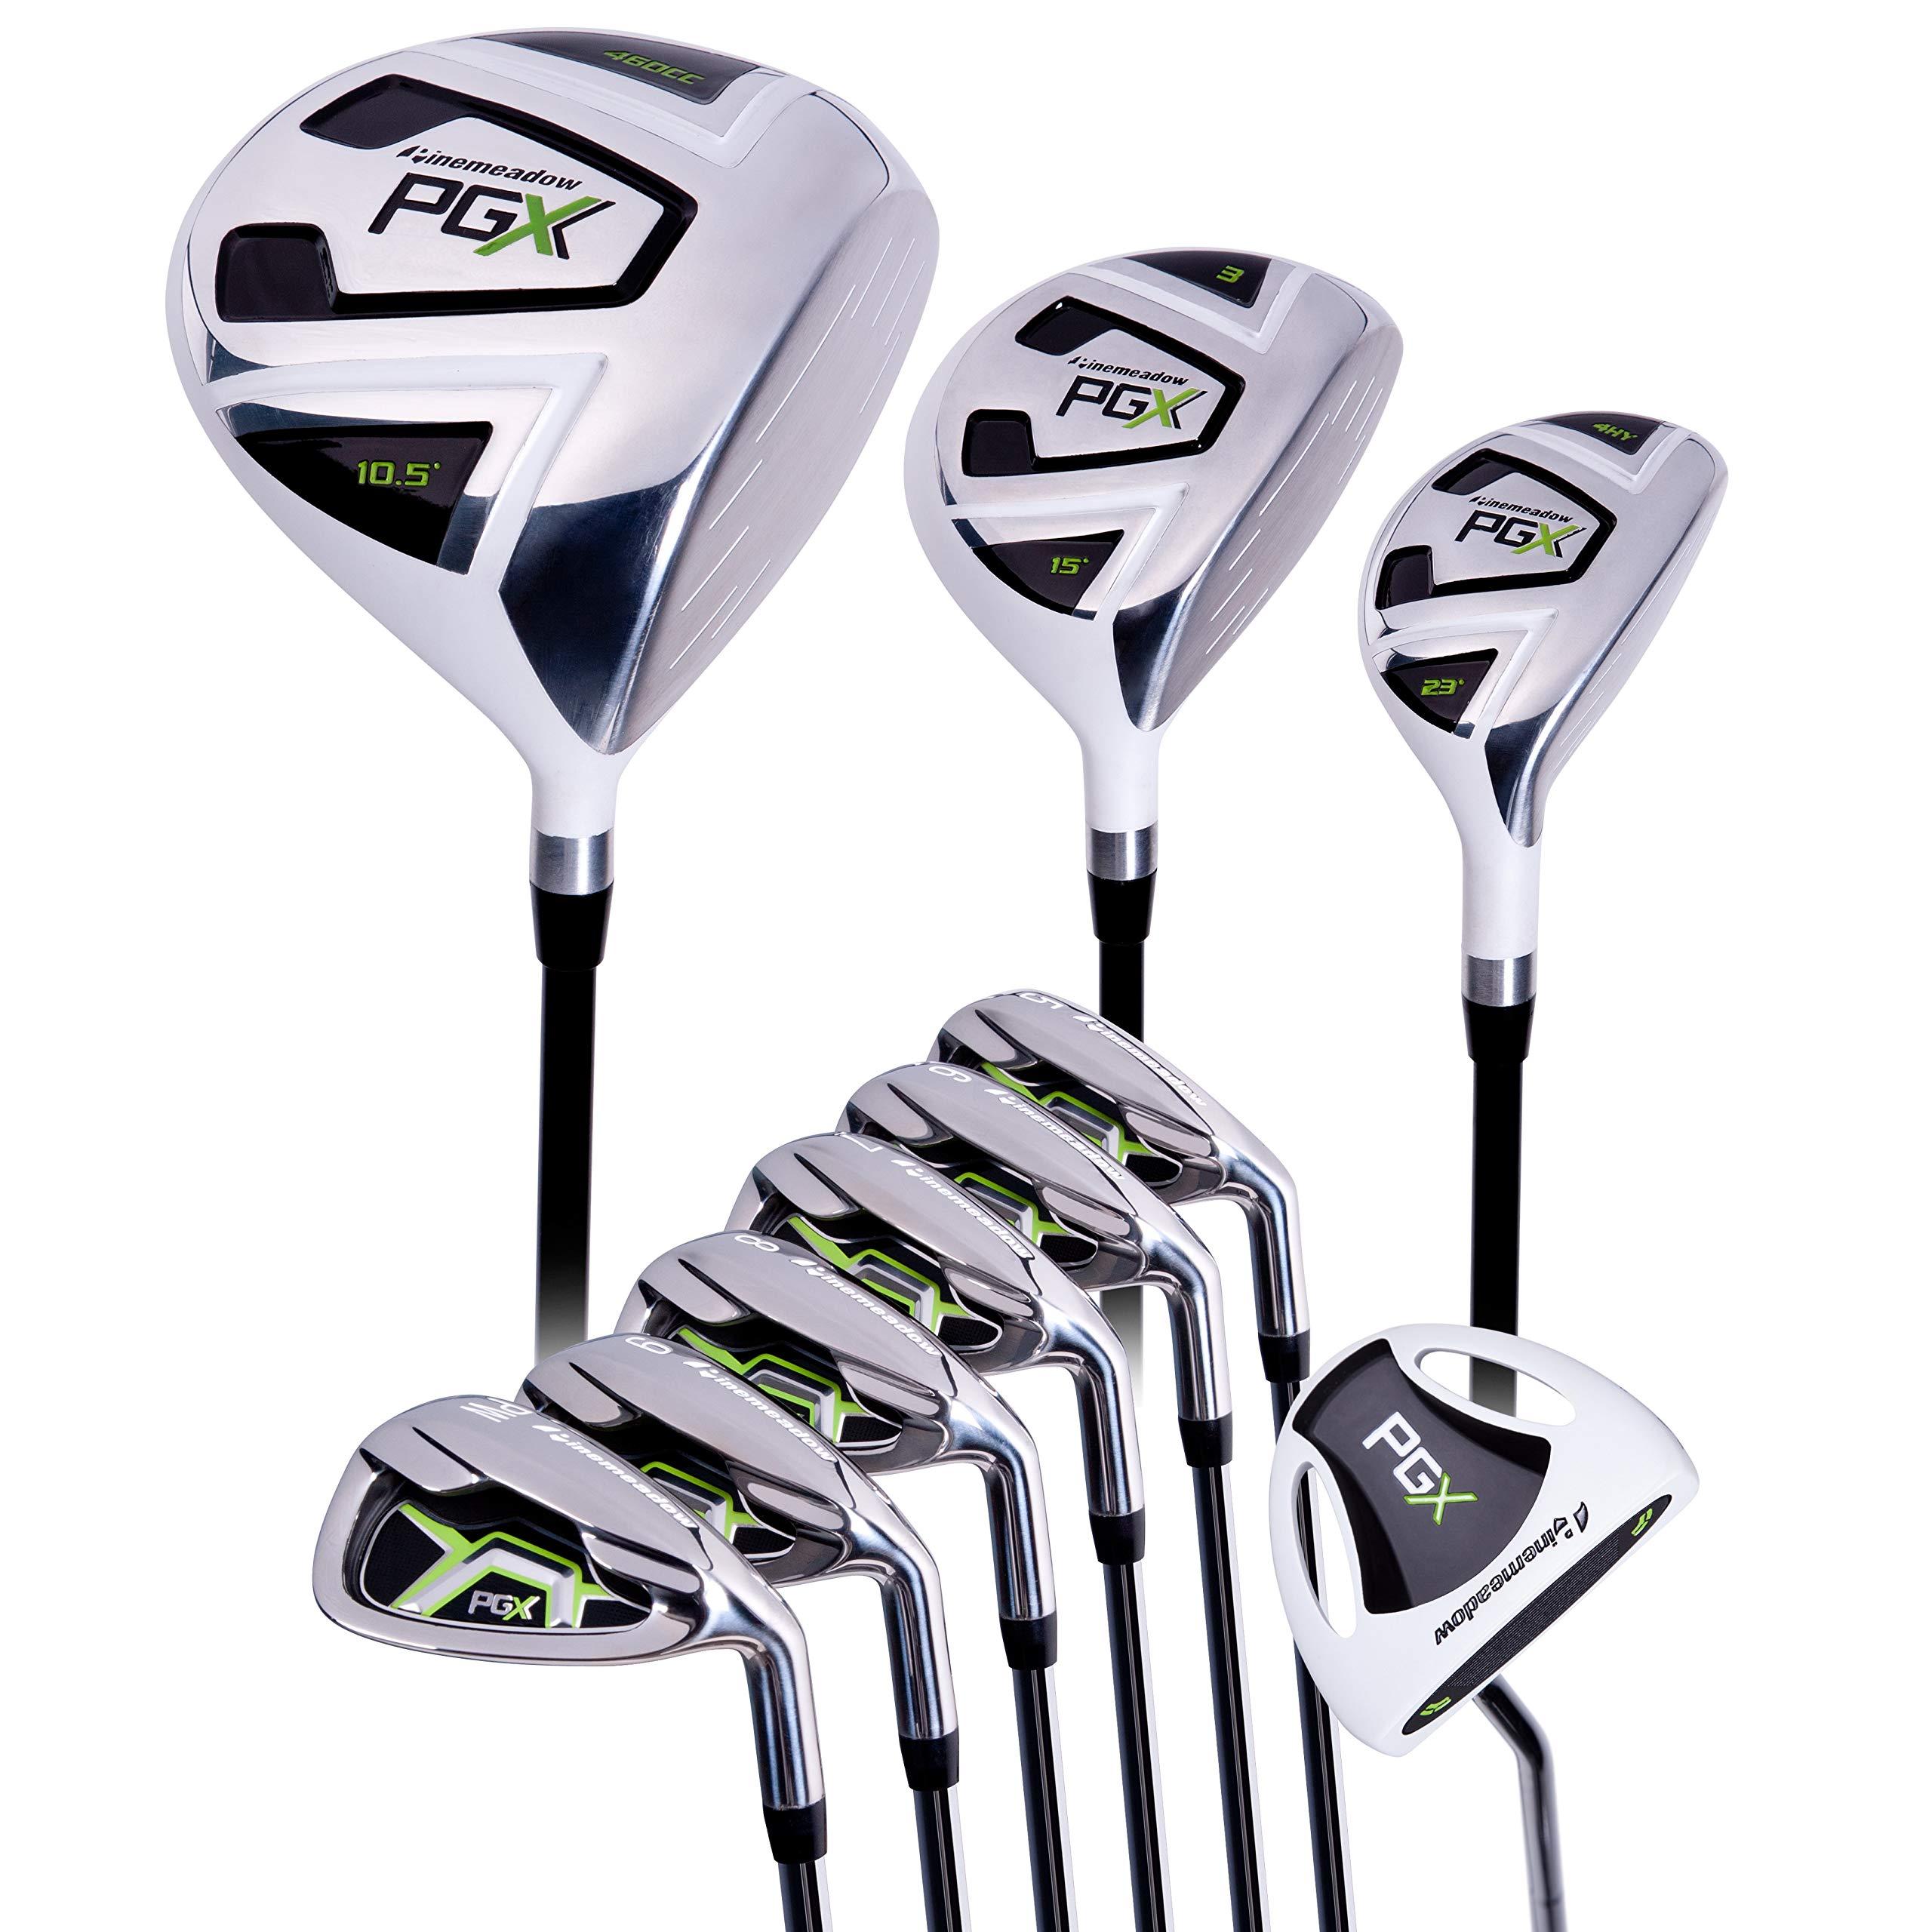 Pinemeadow Golf PGX 9pc Set + PGX Putter by Pinemeadow Golf